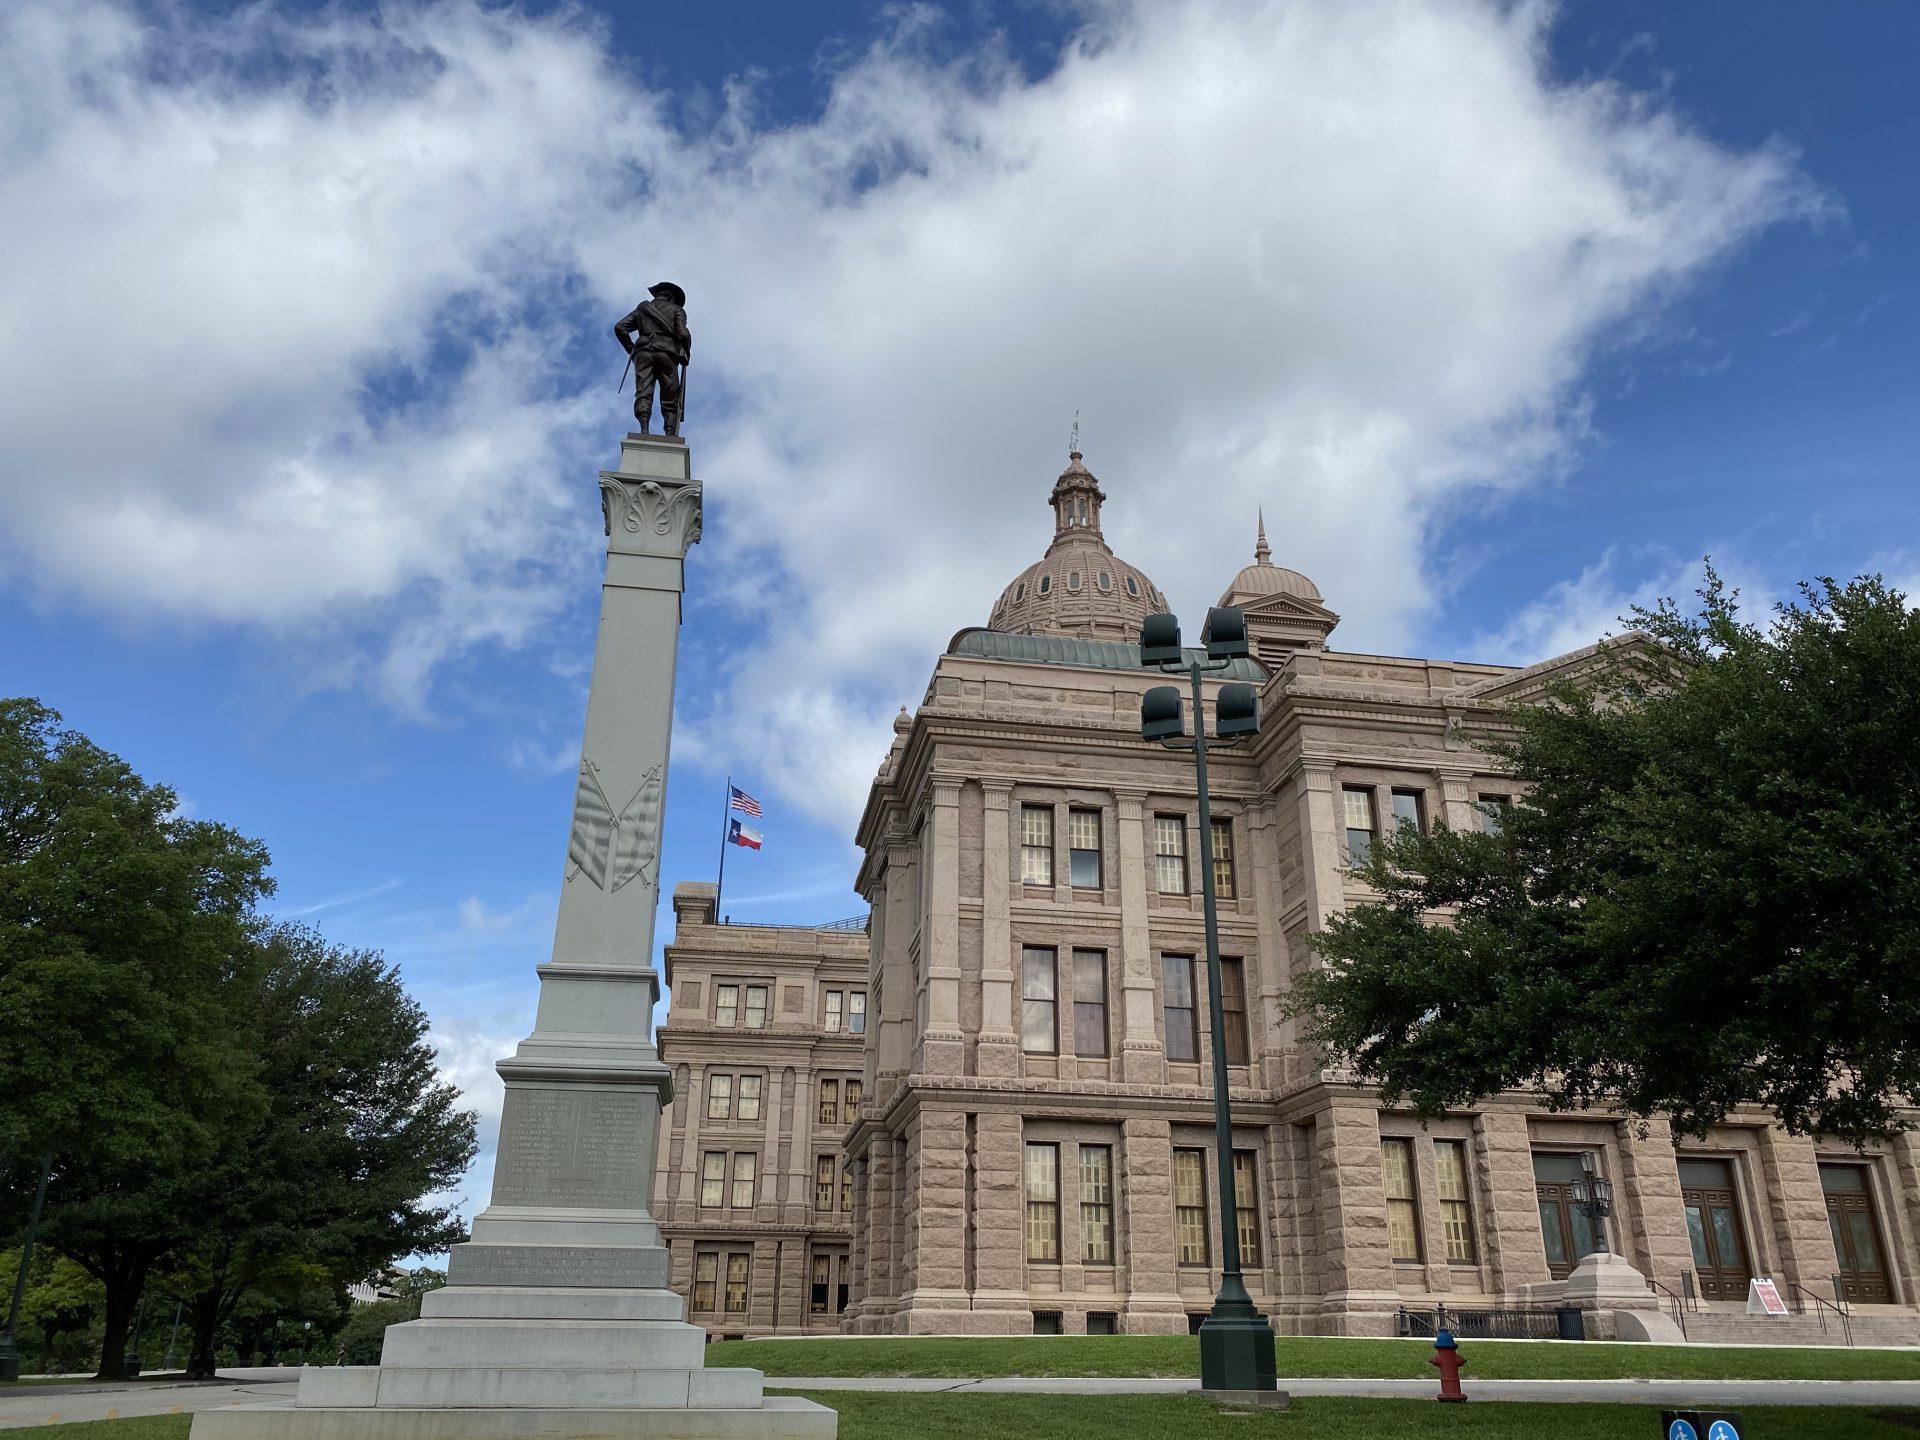 Hood's Brigade monument at Texas Capitol